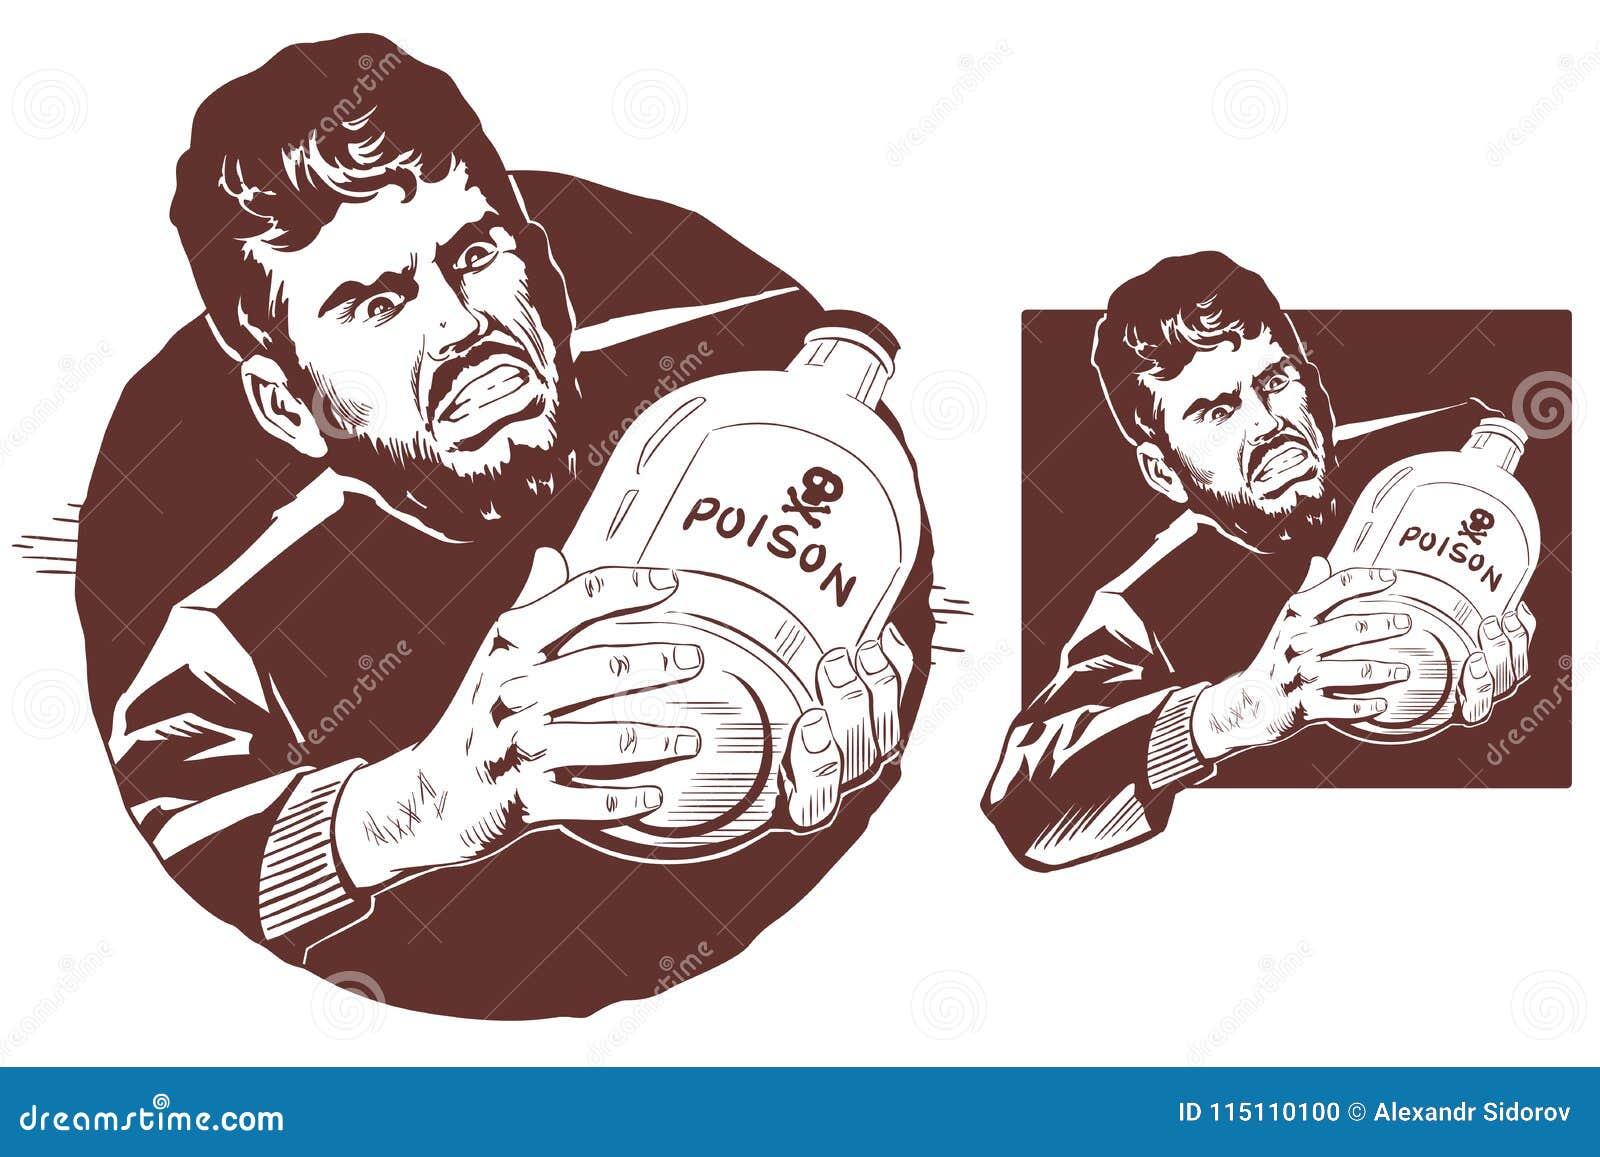 Man with bottle of poison. Stock illustration.